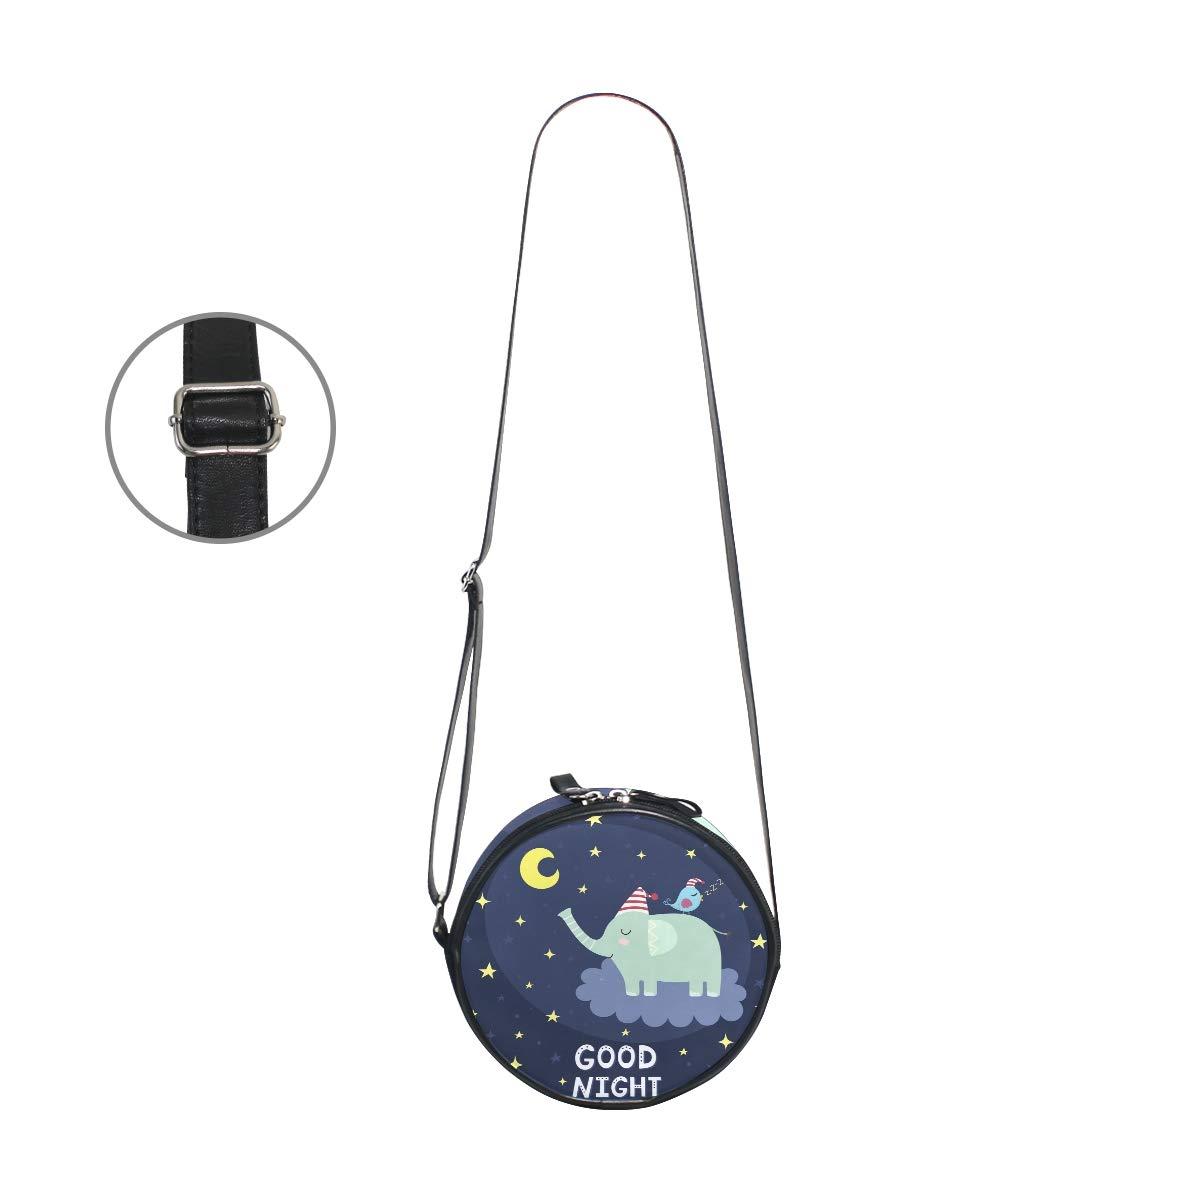 KEAKIA Good Night With Cute Elephant Round Crossbody Bag Shoulder Sling Bag Handbag Purse Satchel Shoulder Bag for Kids Women